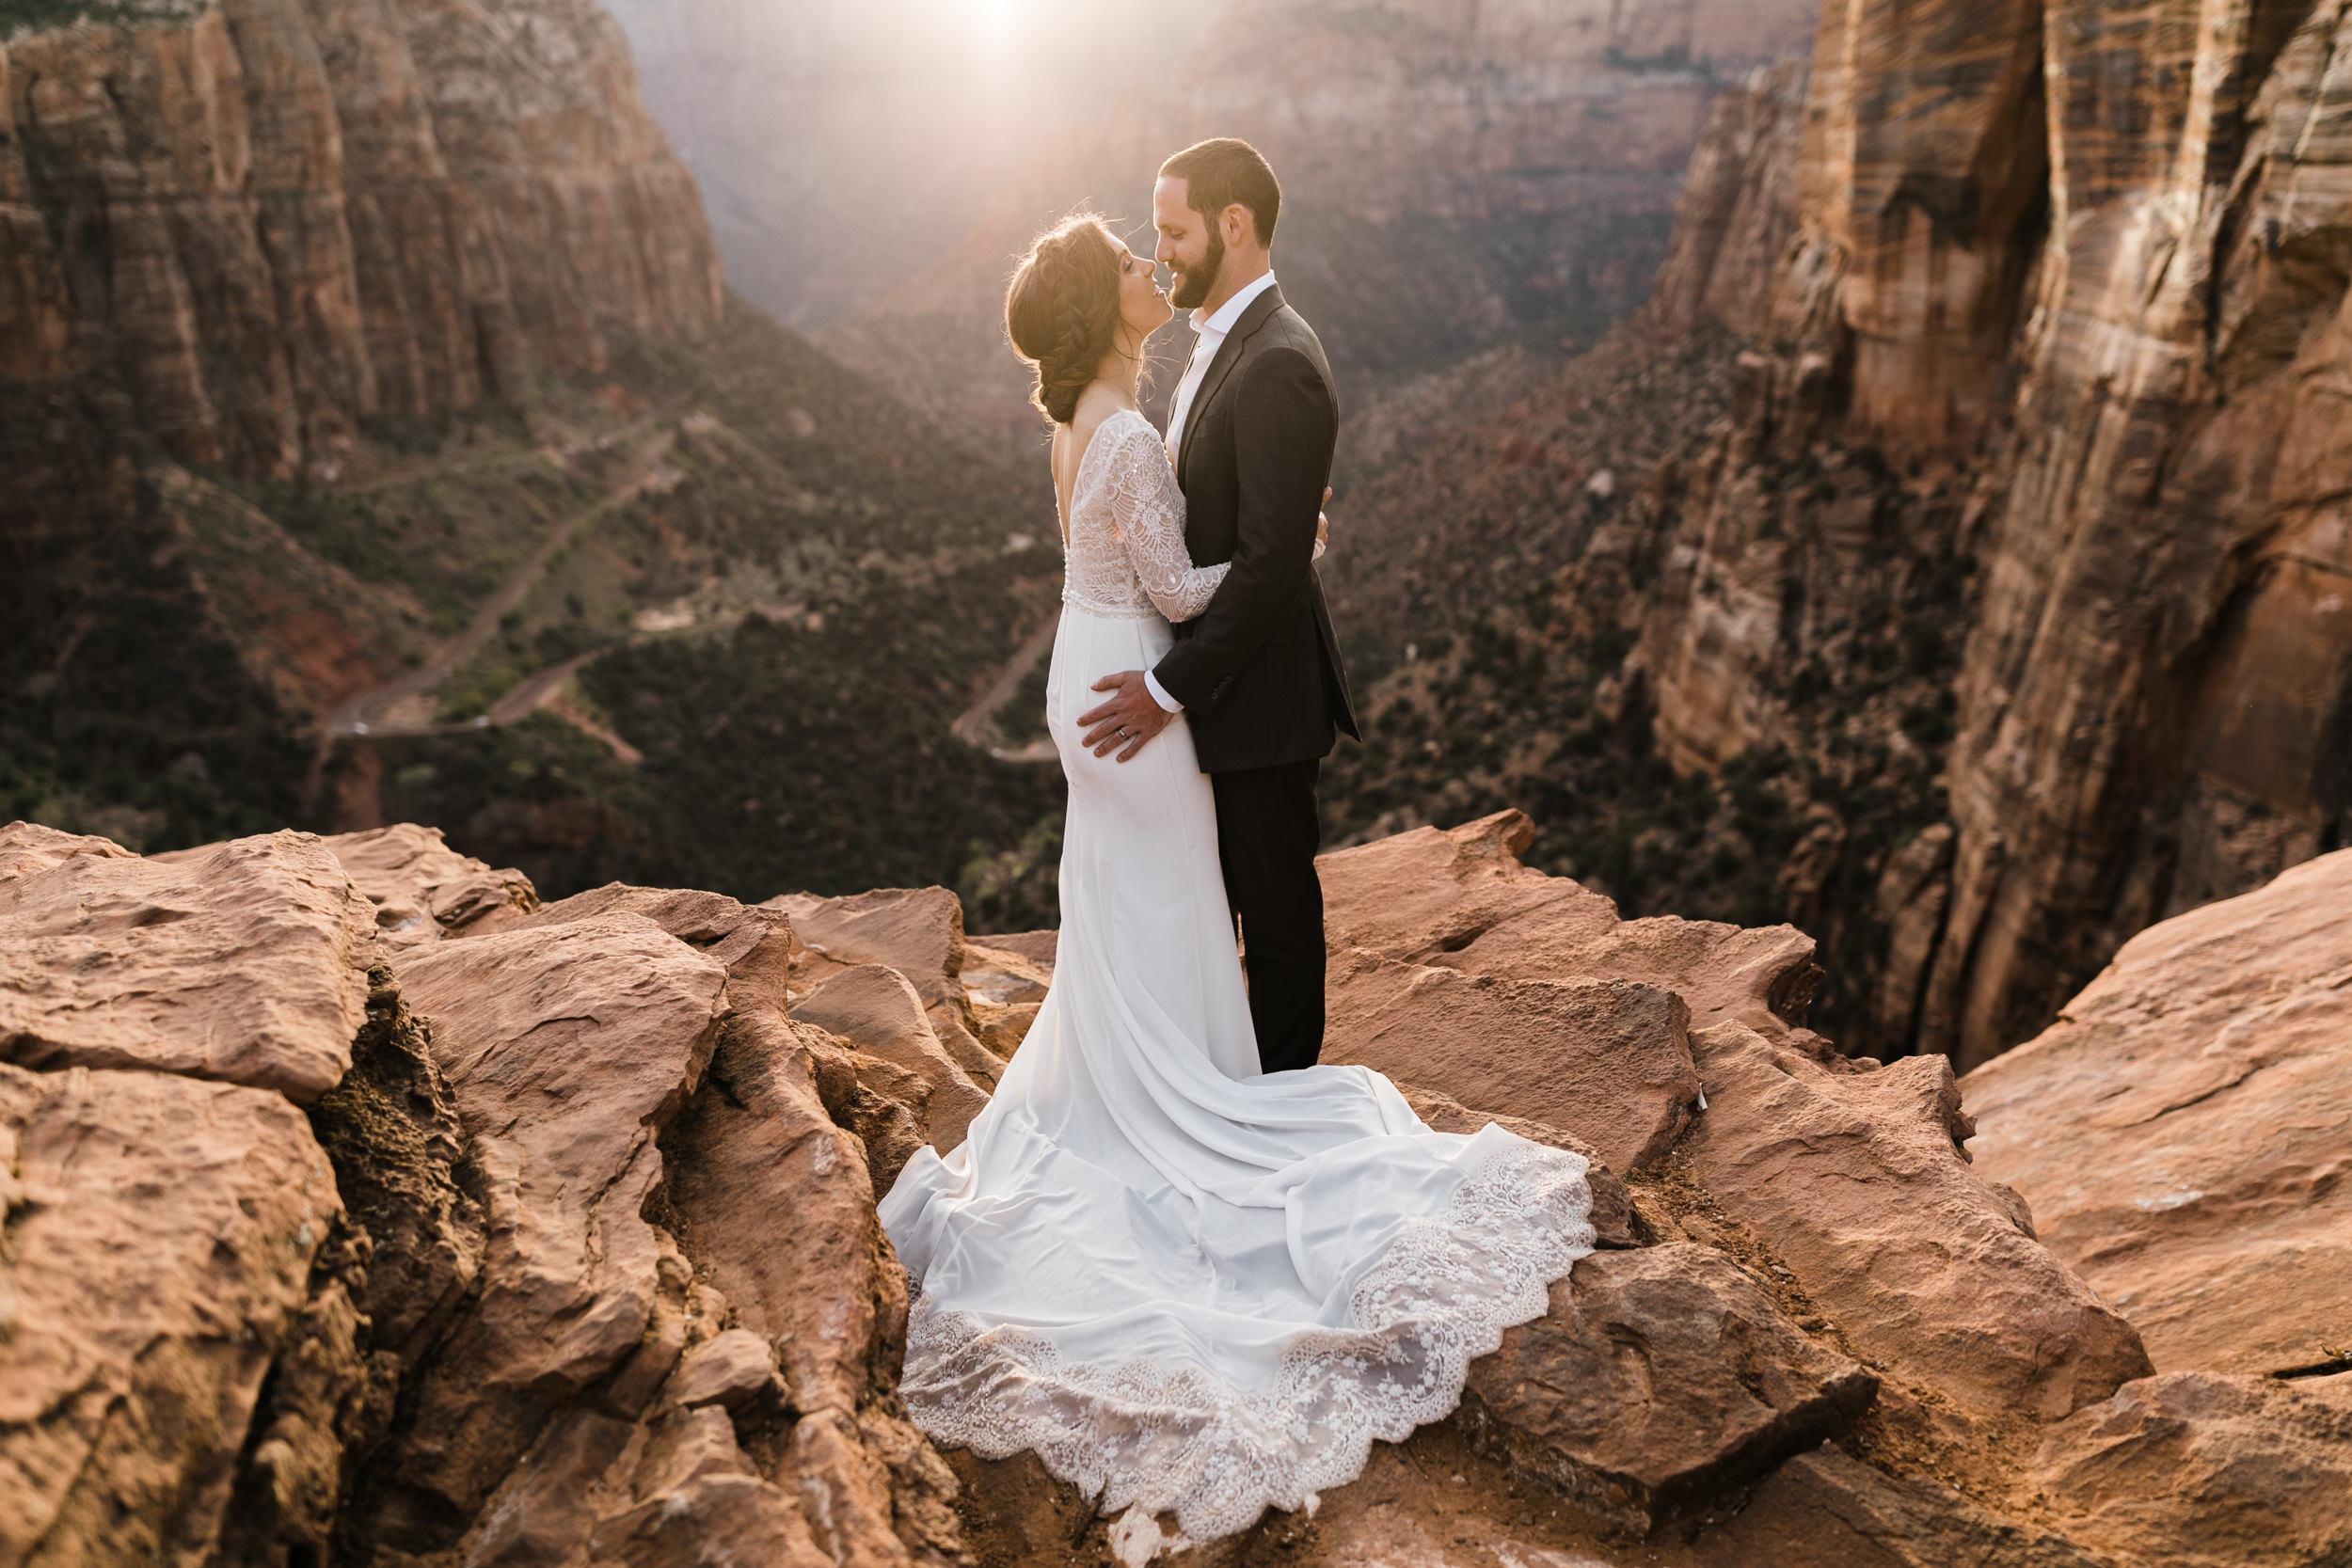 Zion-National-Park-Adventure-Wedding-Hearnes-Elopement-Photography-46.jpg